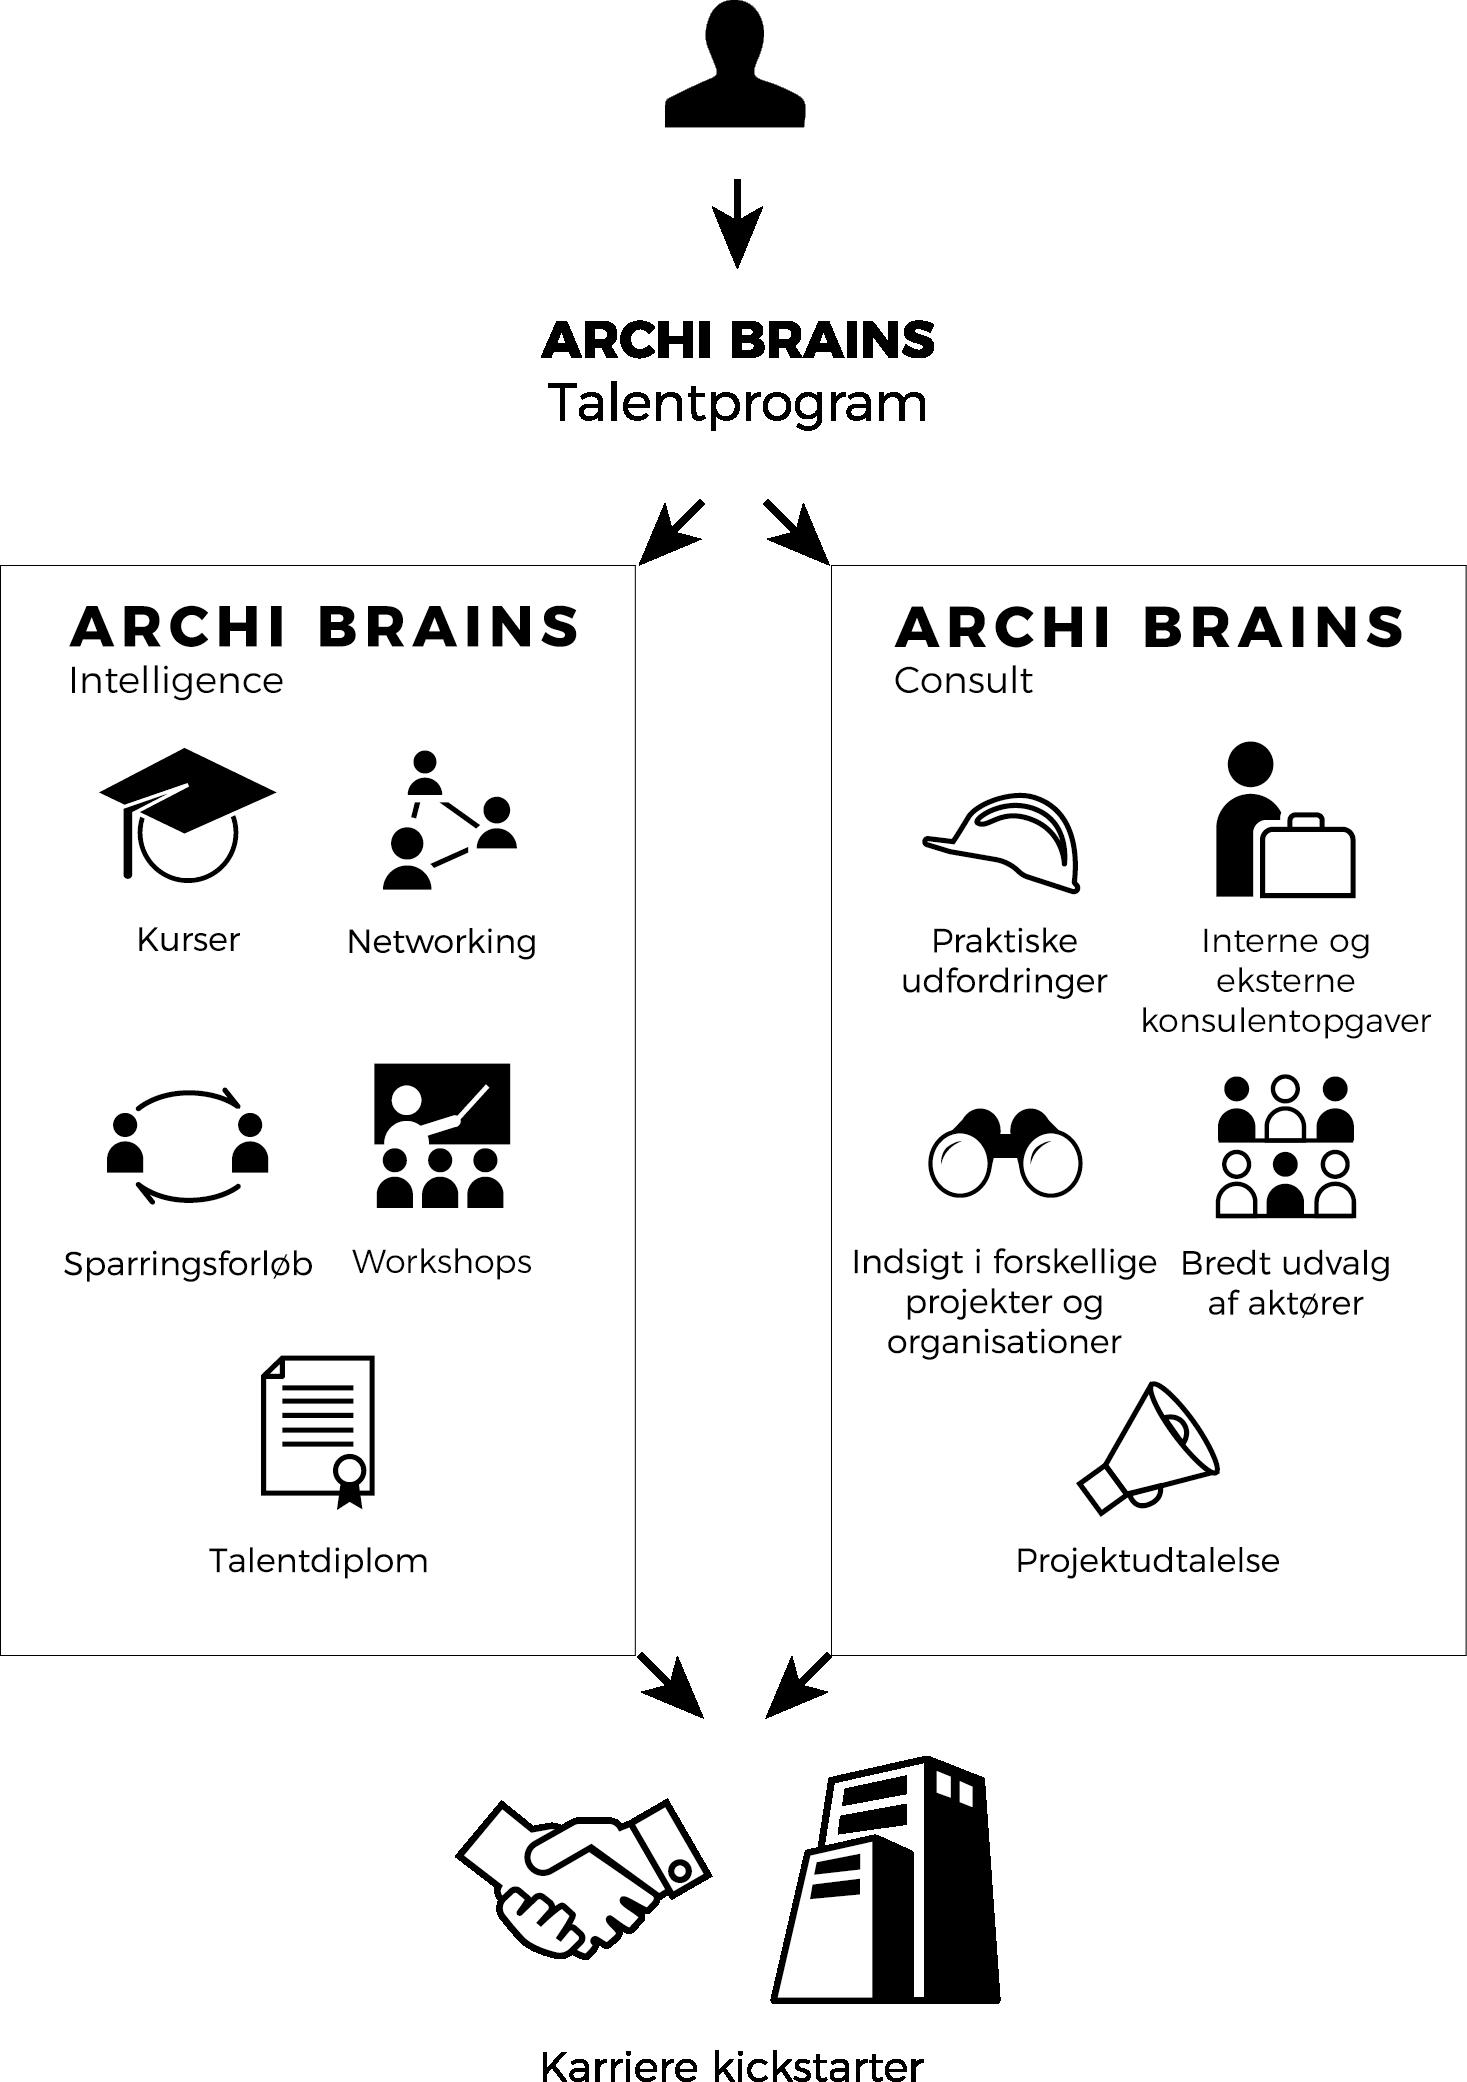 archi brains